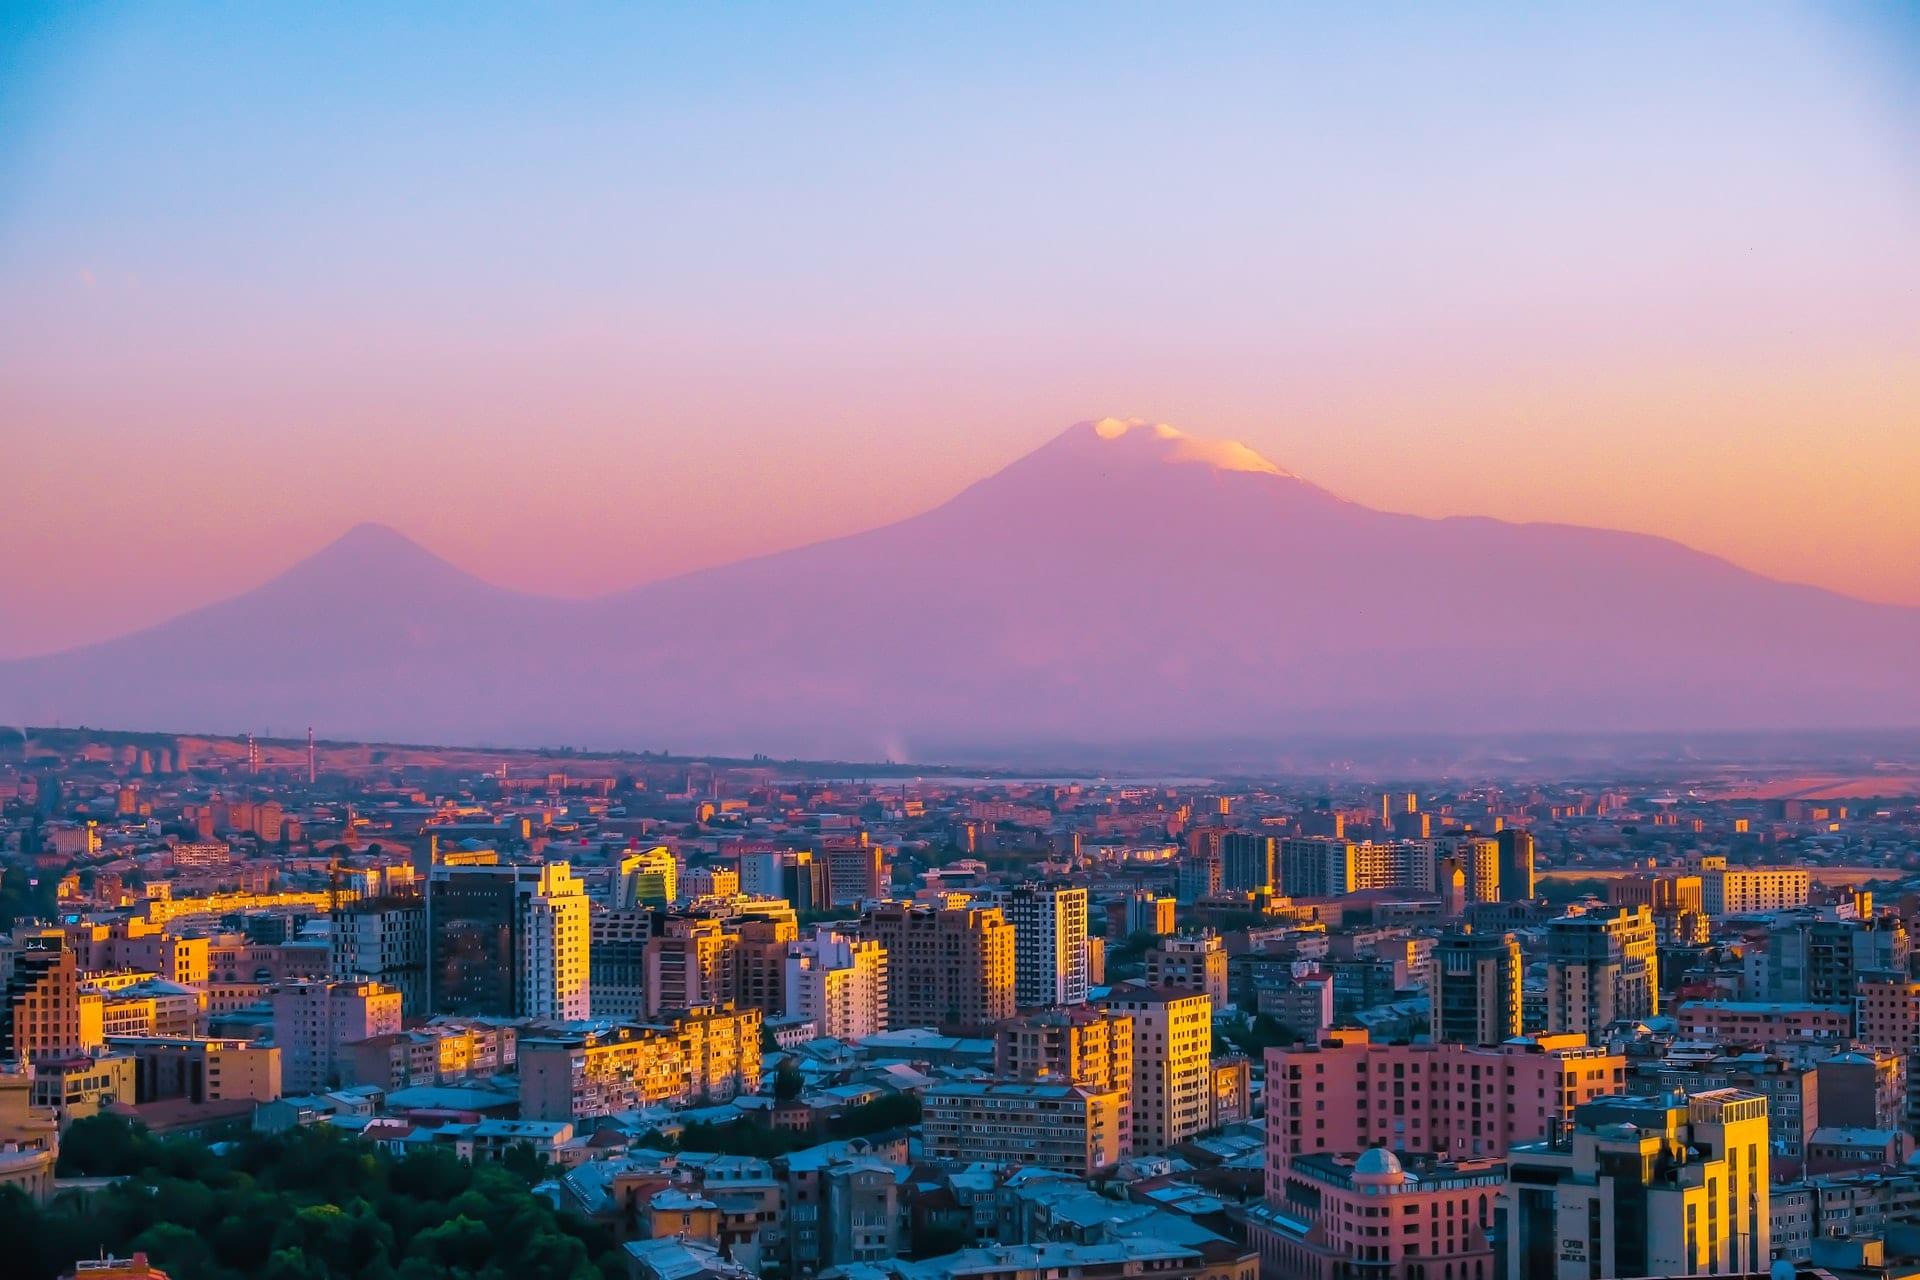 sunset over yerevan